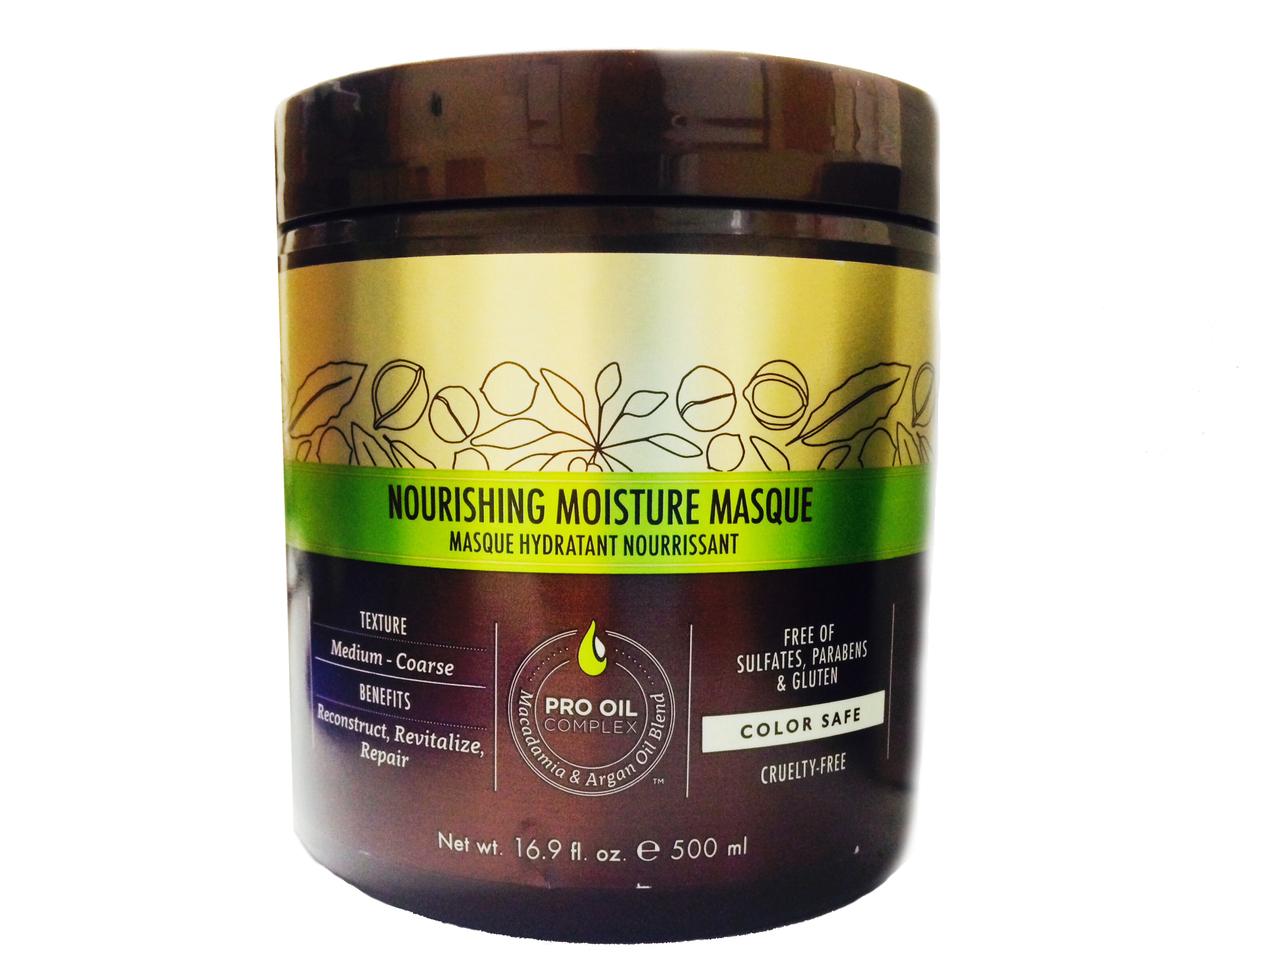 Nourishing moistur mask16.9  20846